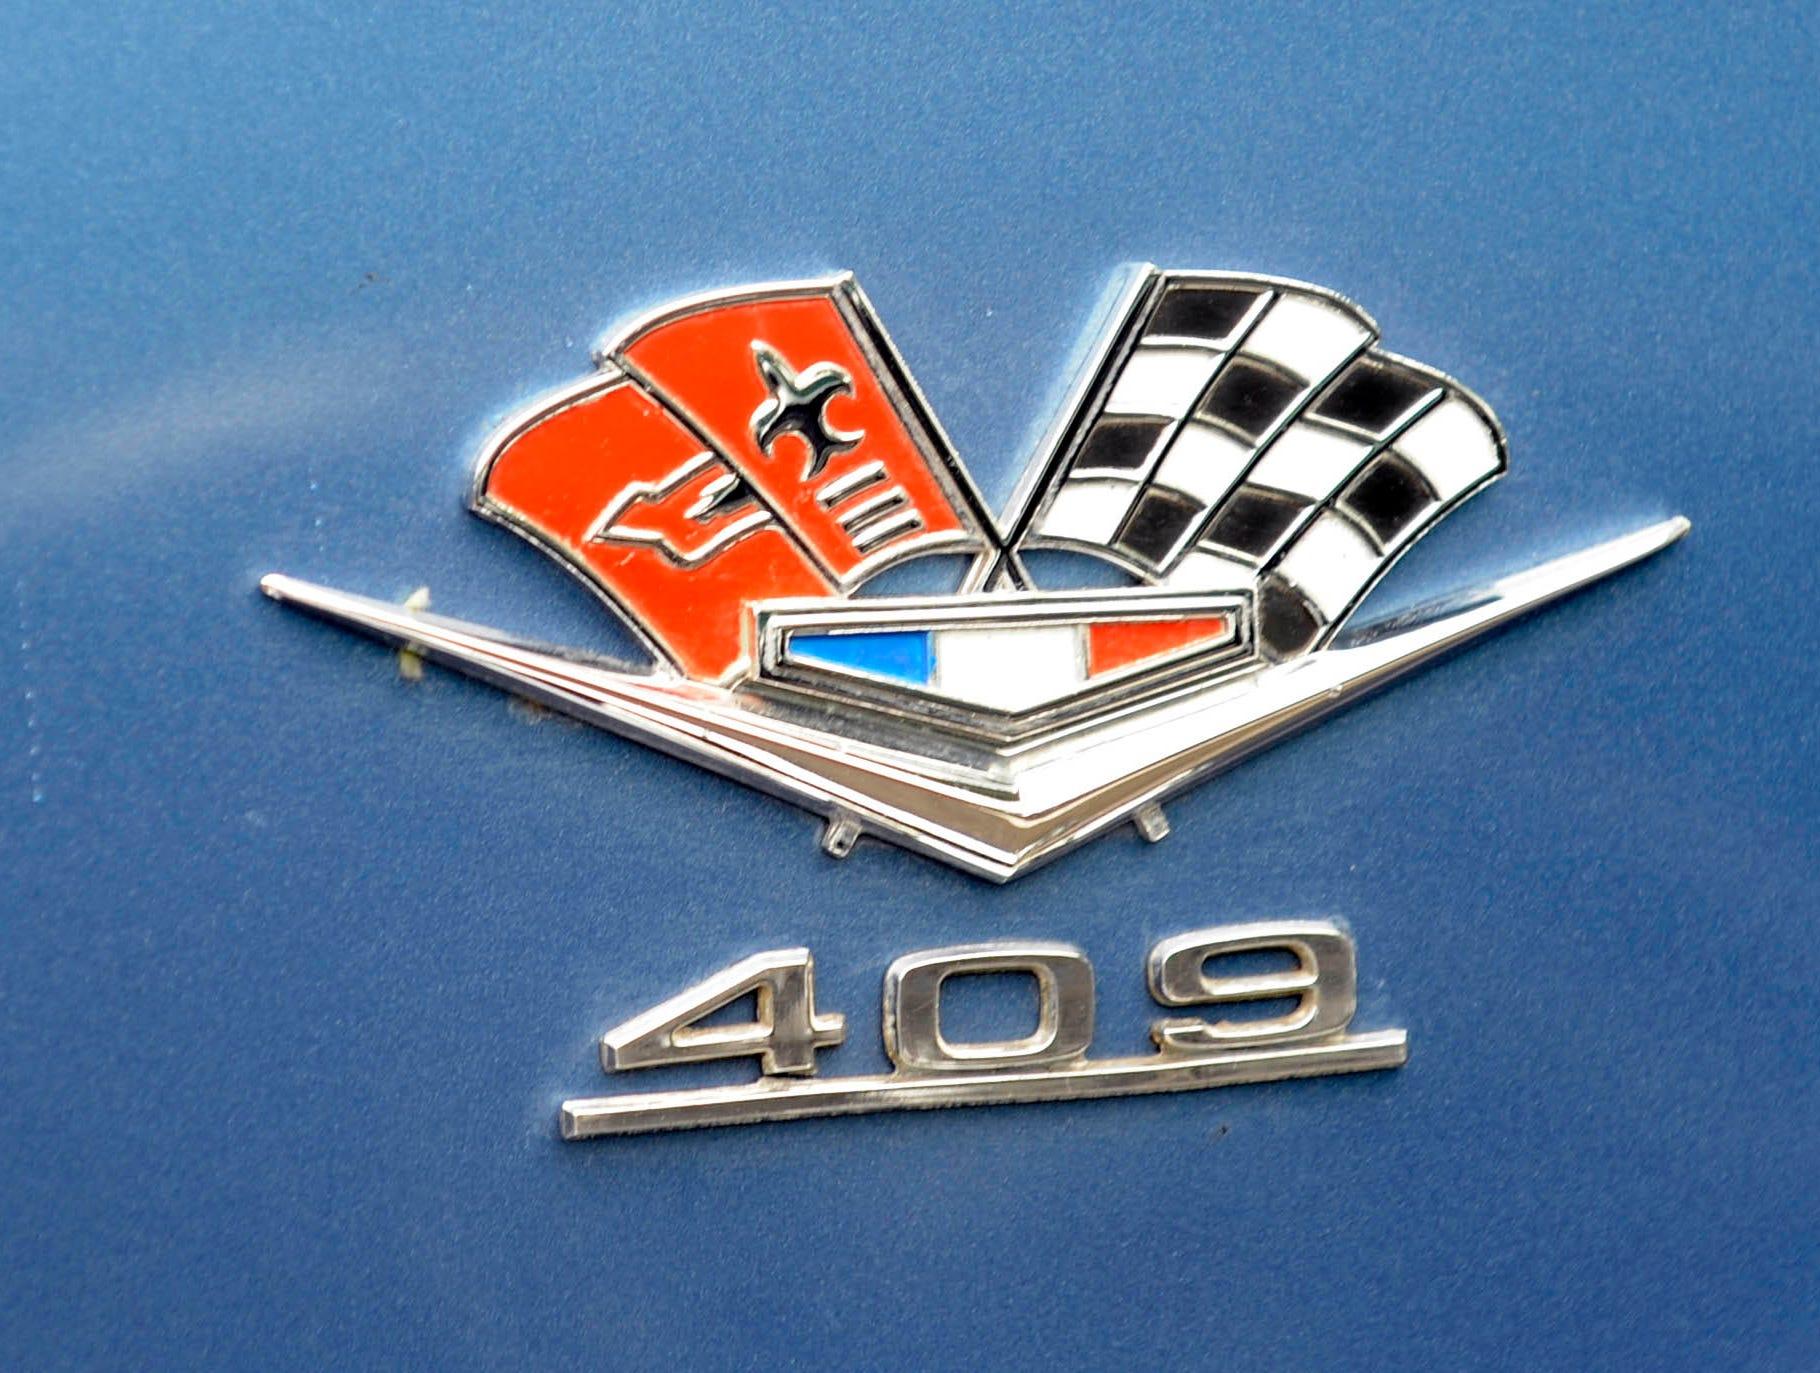 A 409 Cubin Inch Chevy engine logo of a 1962 Chevrolet Impala Super Sport owned by  John Schraufnagel in Birmingham.